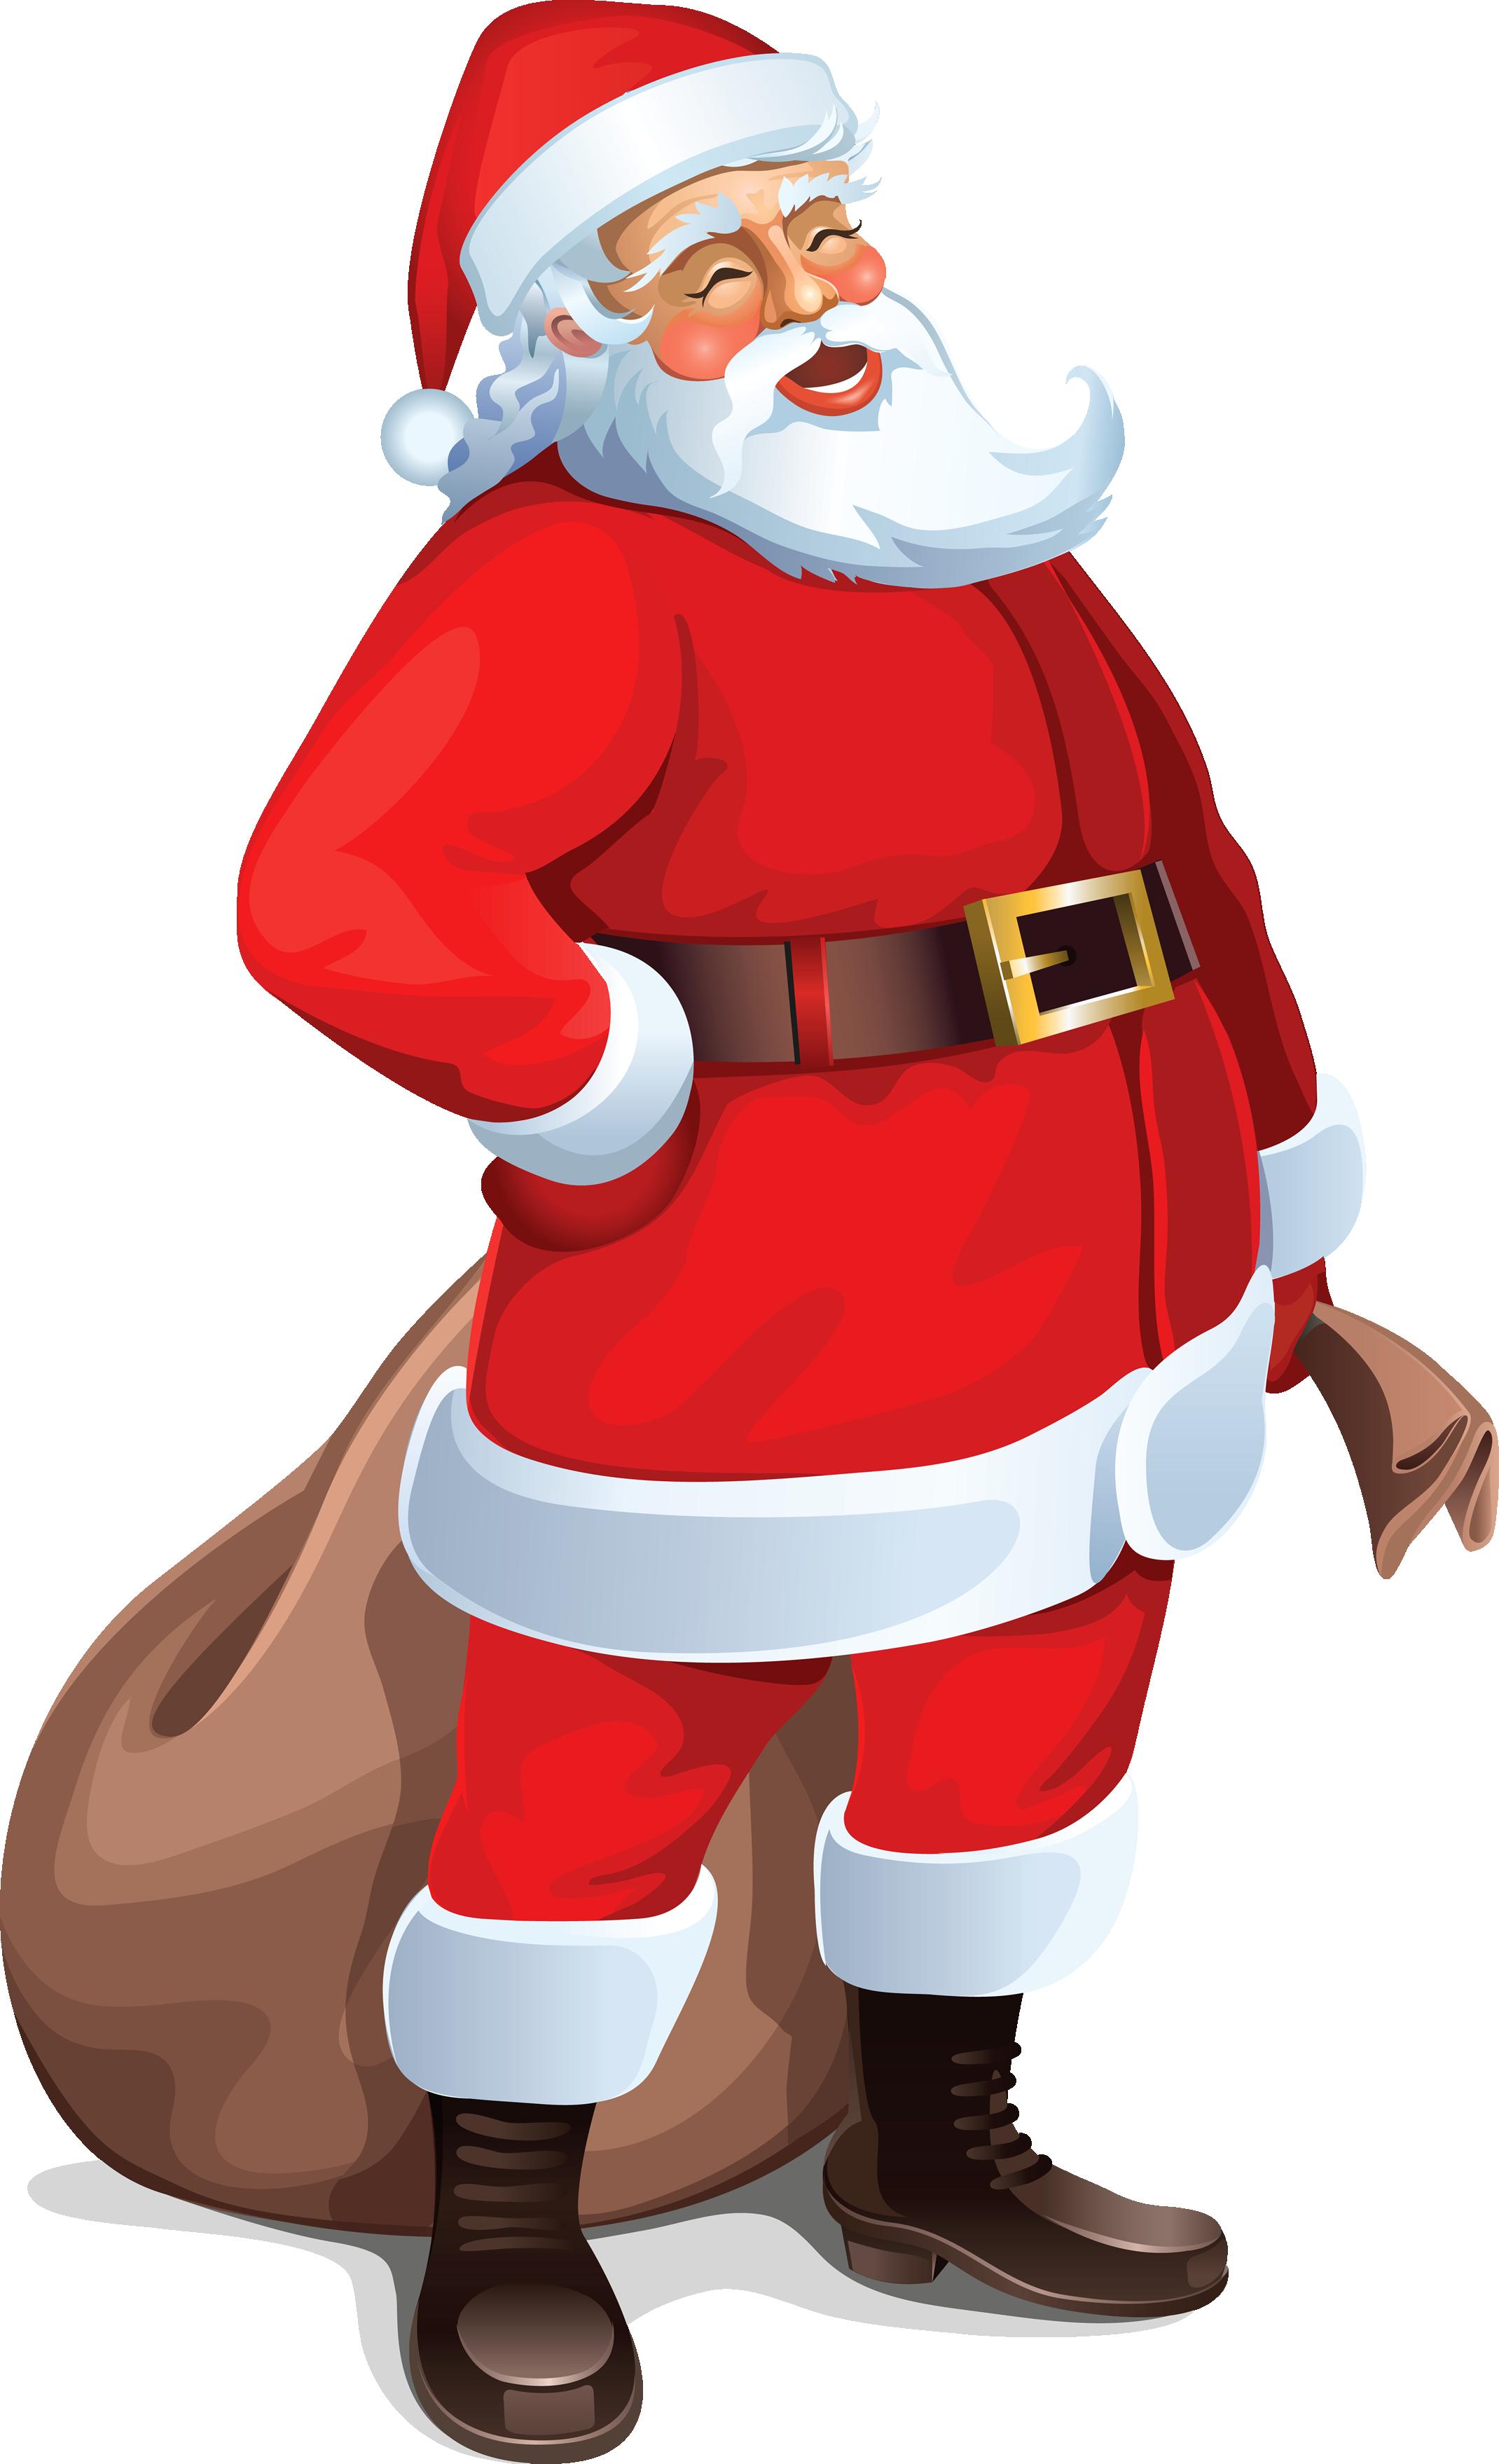 e16eedc7aba19 Download Santa Claus Free Download HQ PNG Image